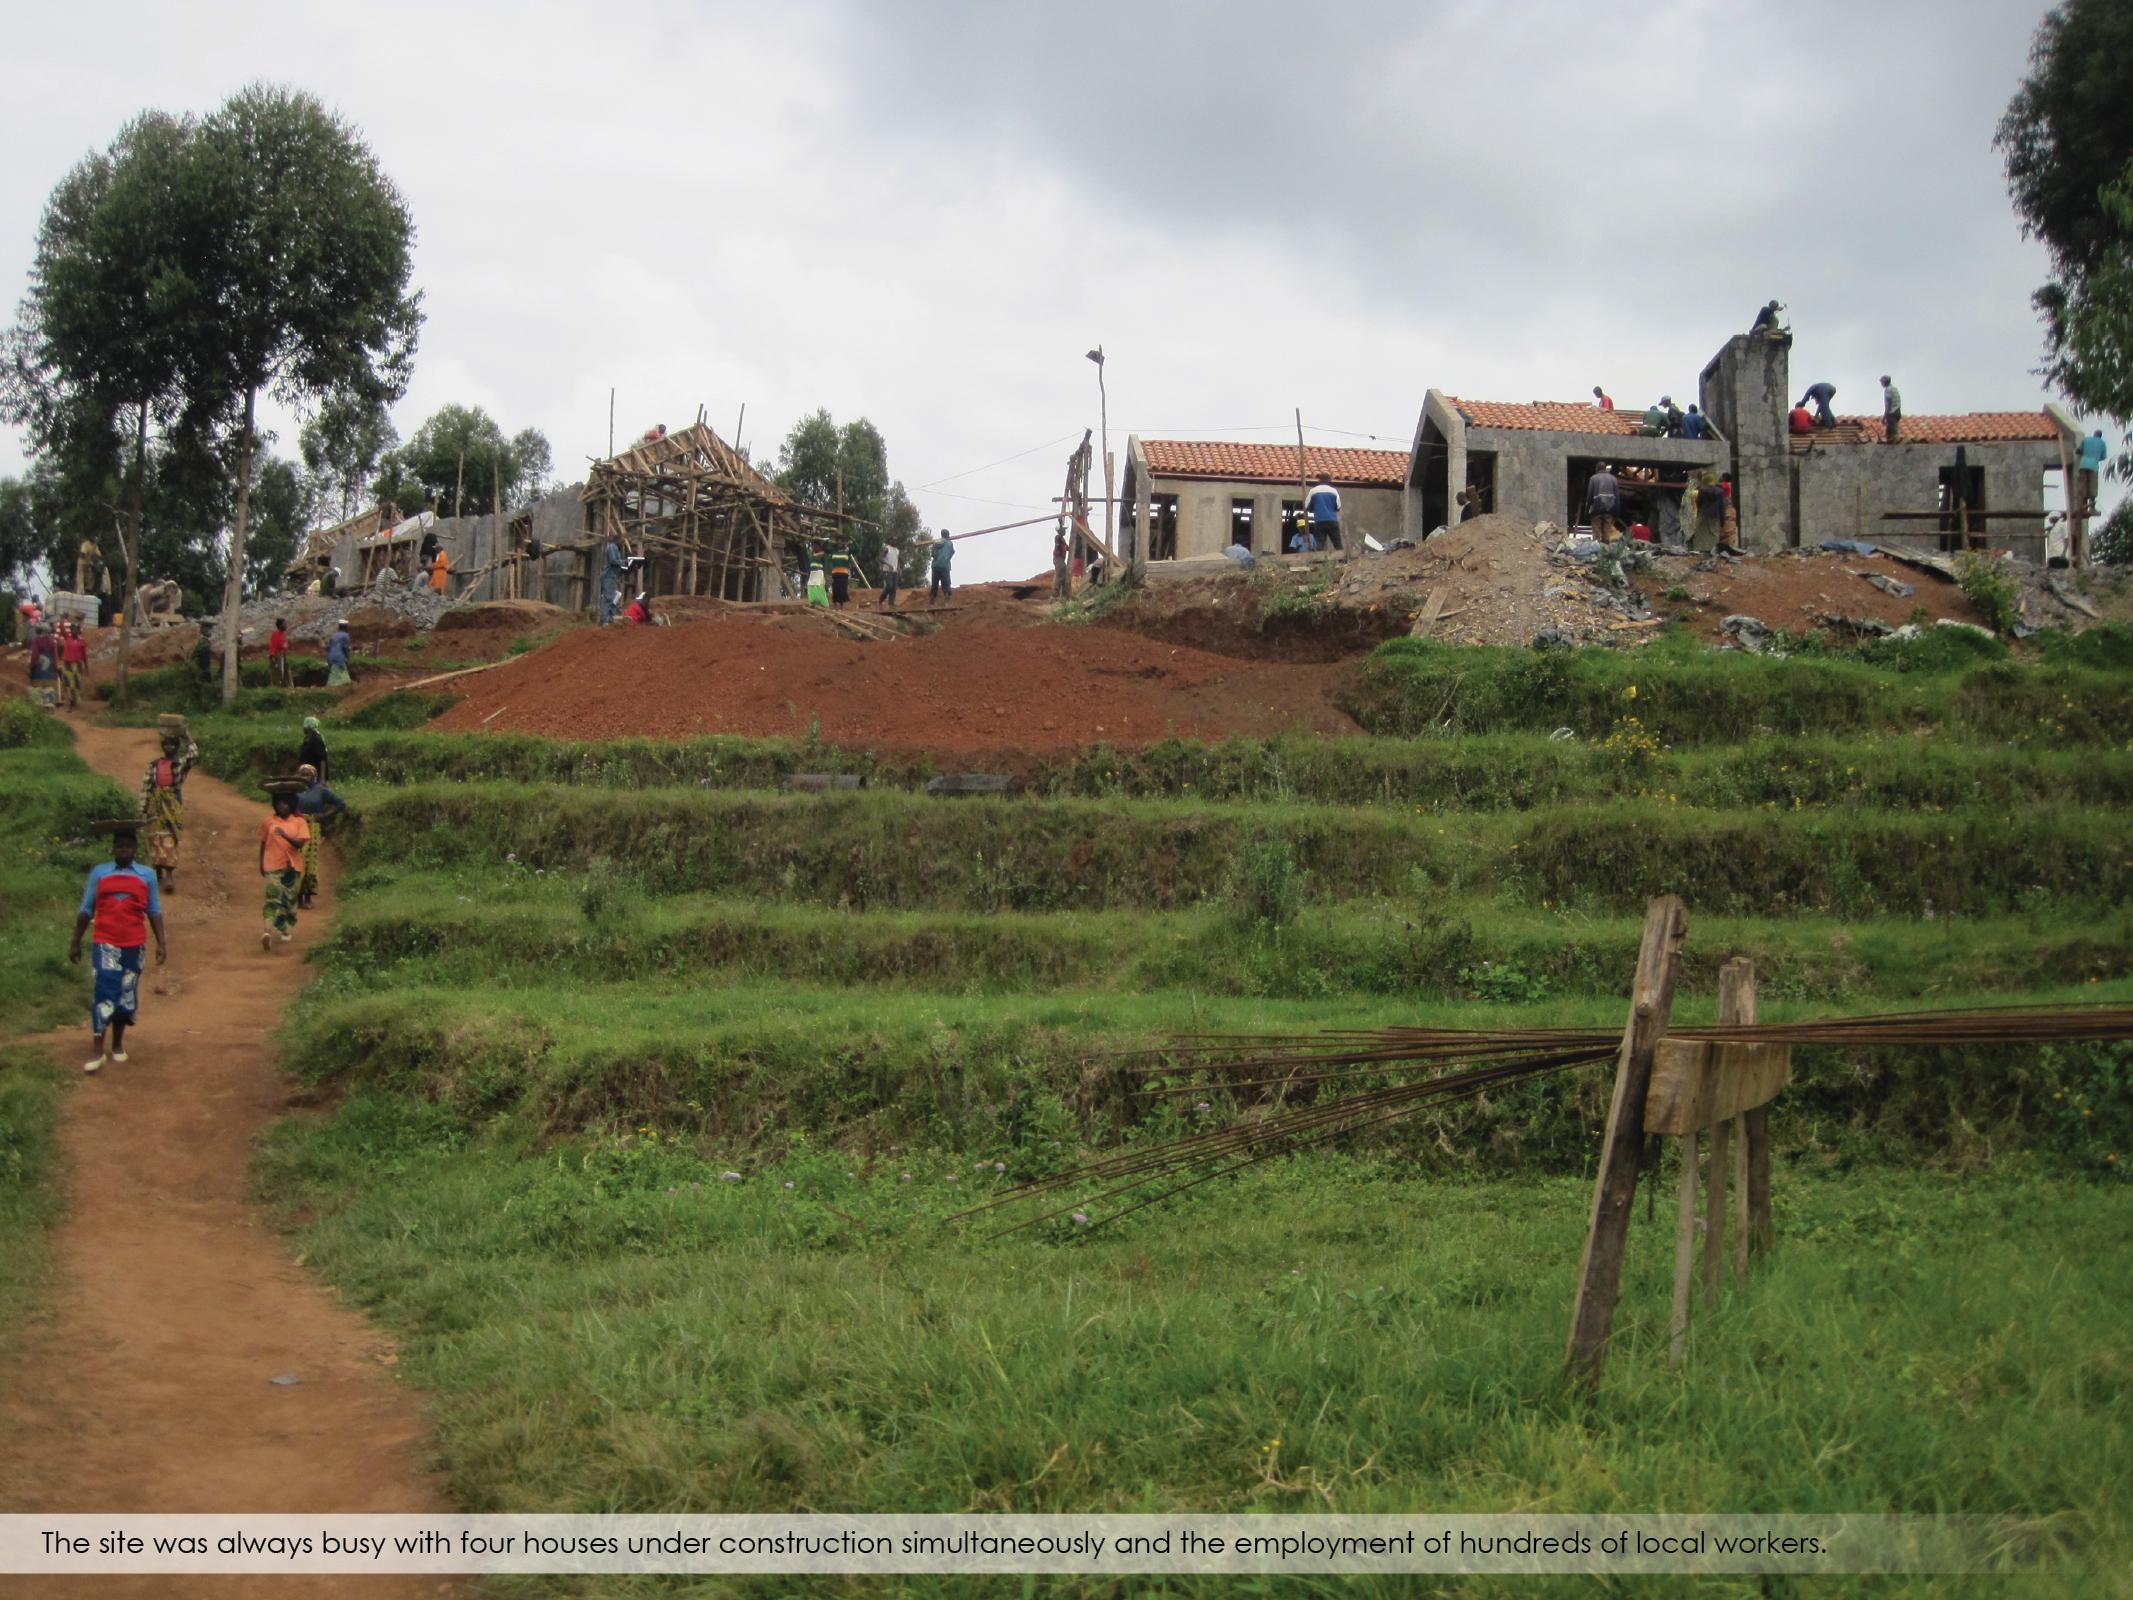 Gaugler_RwandaExperience_p35.jpg